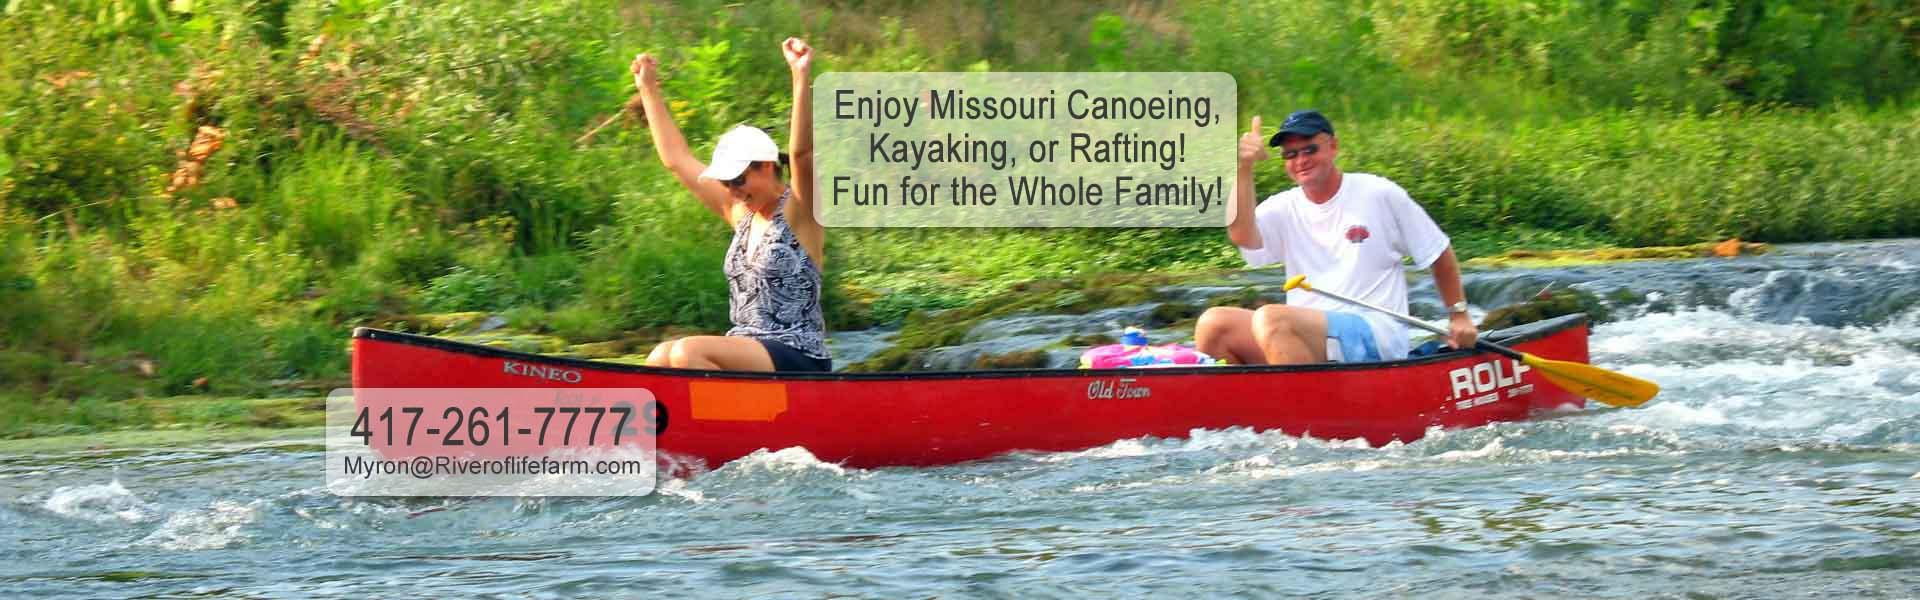 River of Life Farm Missouri Vacation